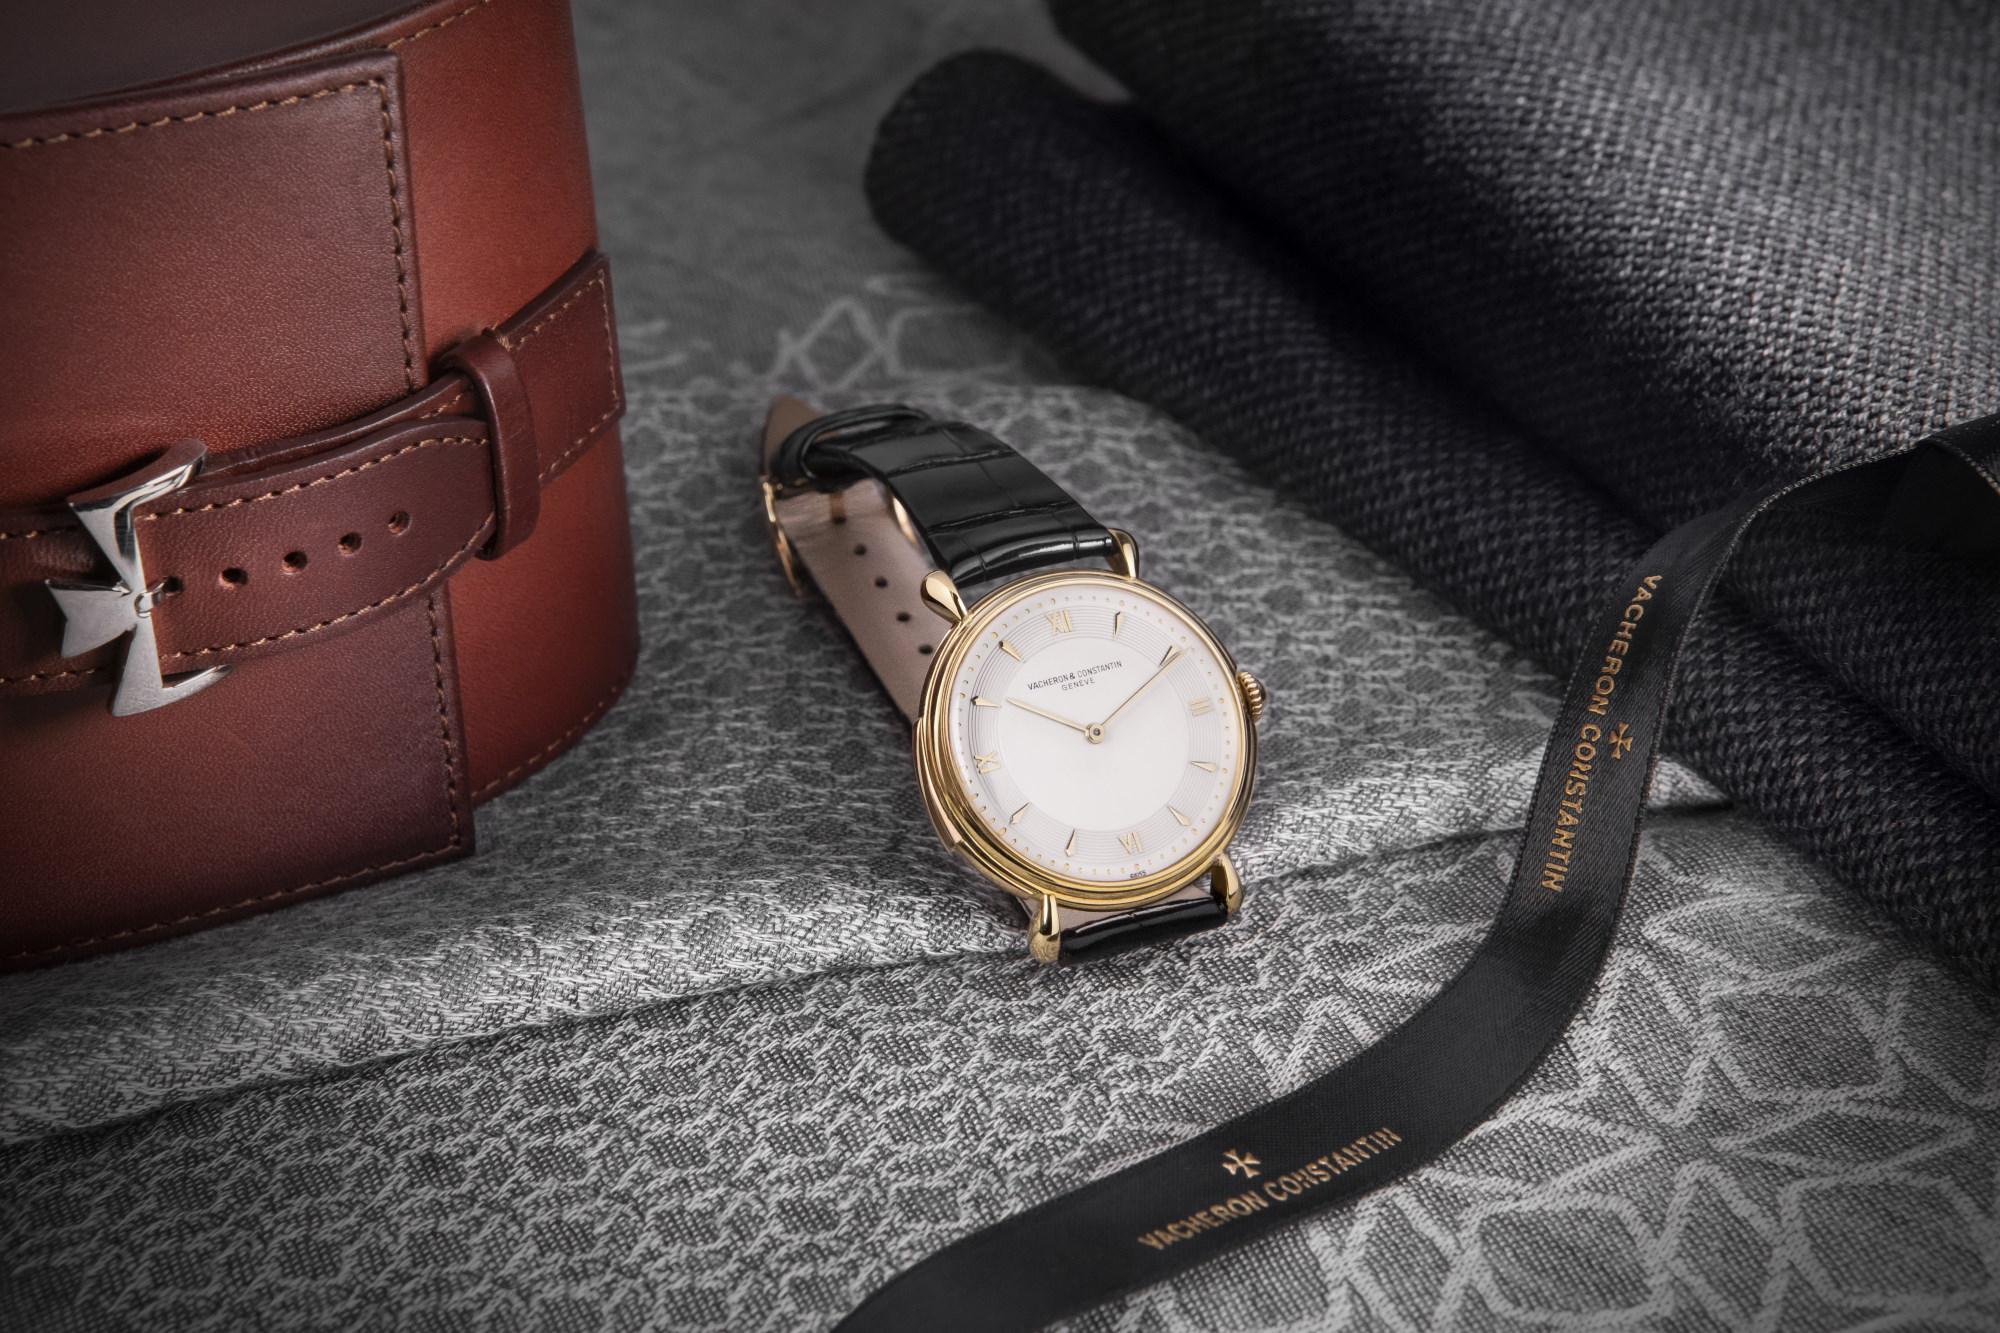 Old Is Gold: Vacheron Constantin Displays Watchmaking Heritage